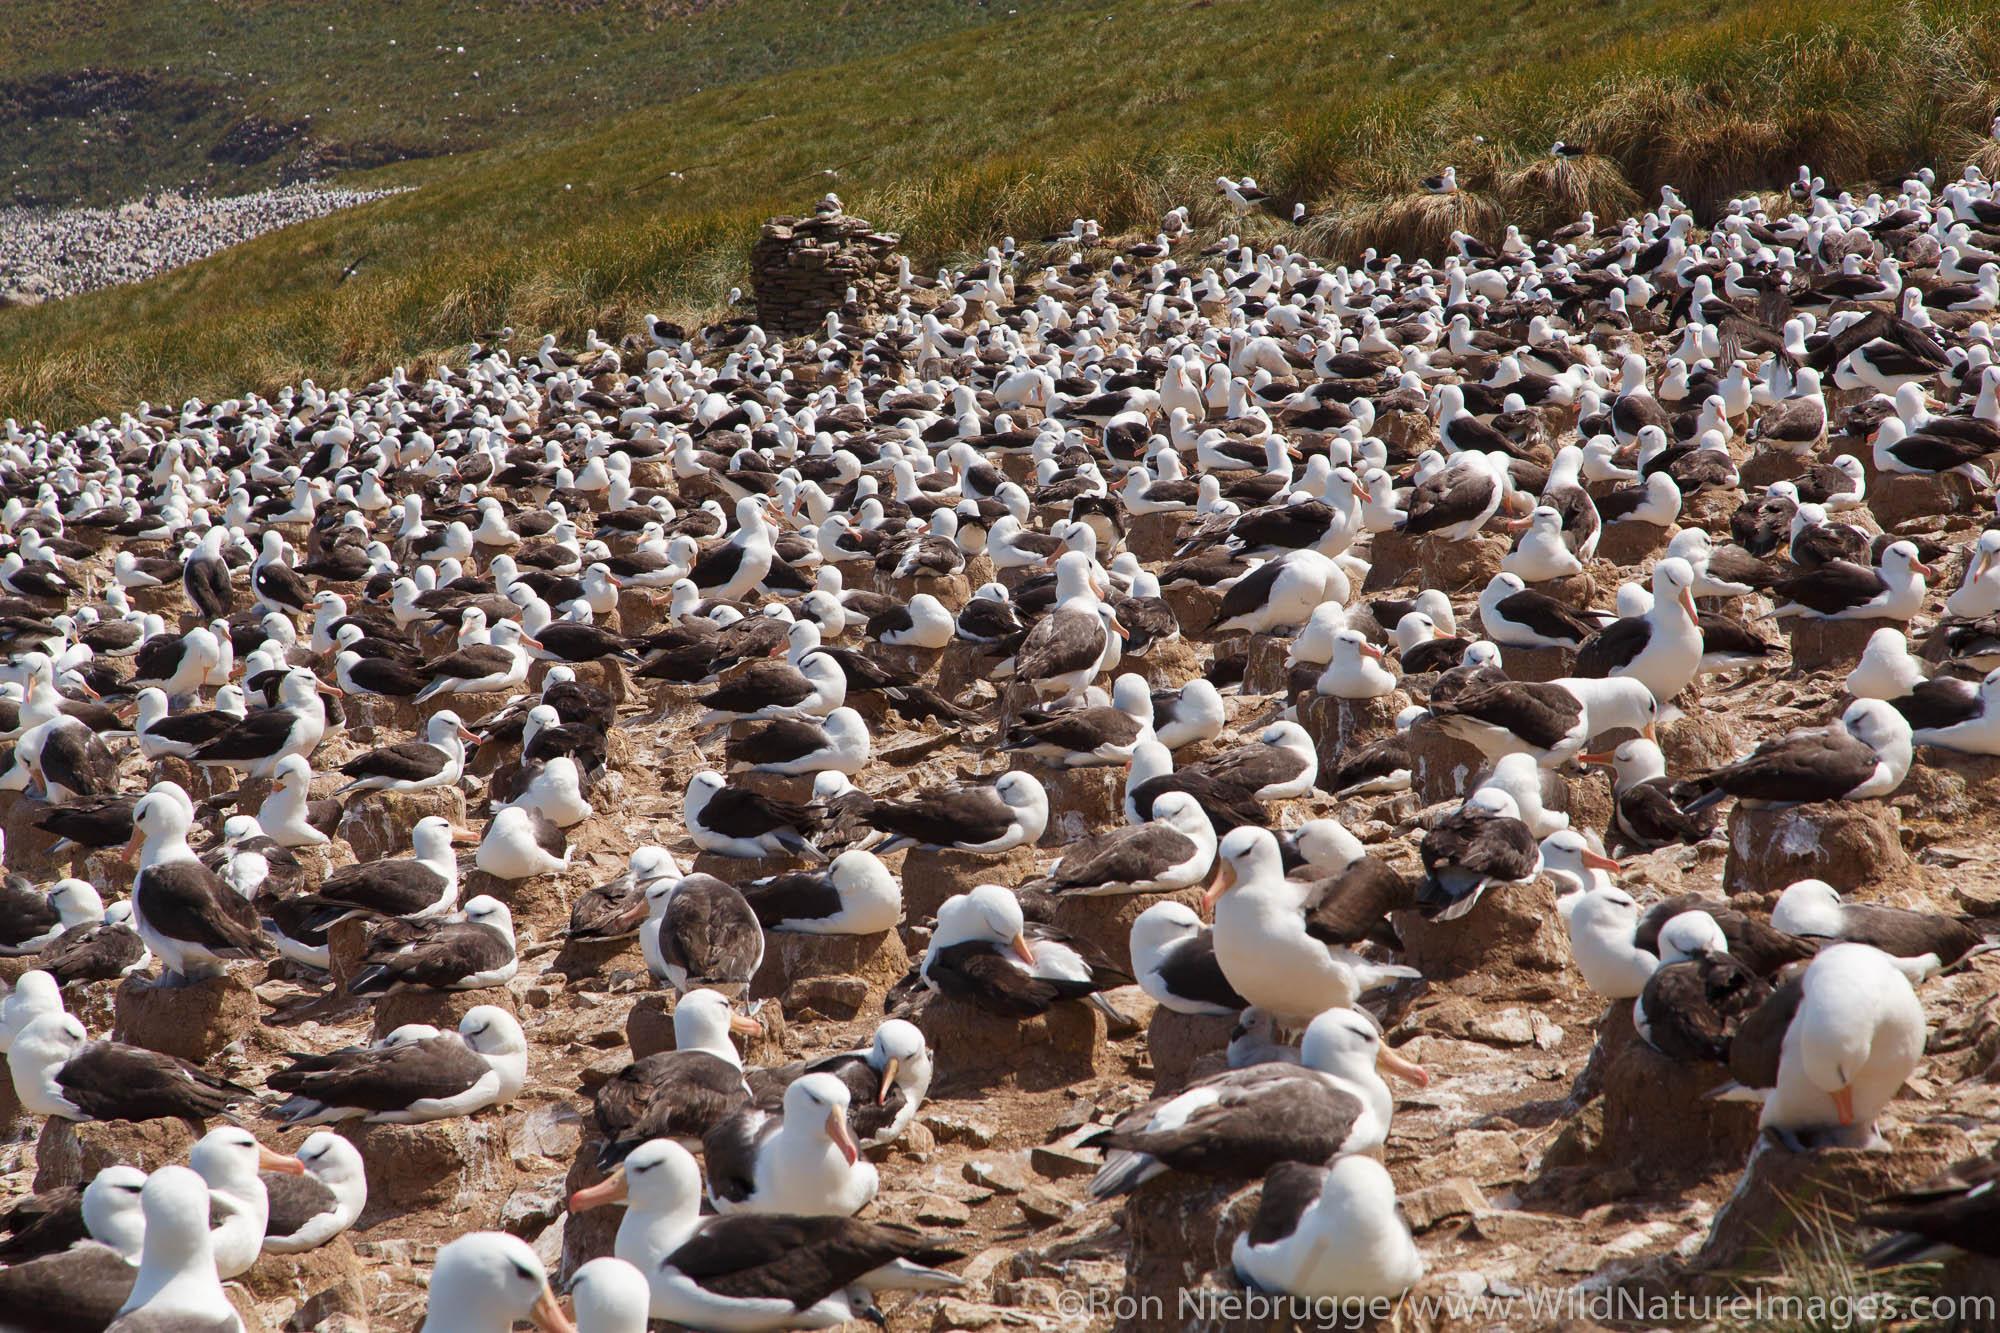 A huge colony of Black-browed Albatross on Steeple Jason, Falkland Islands.